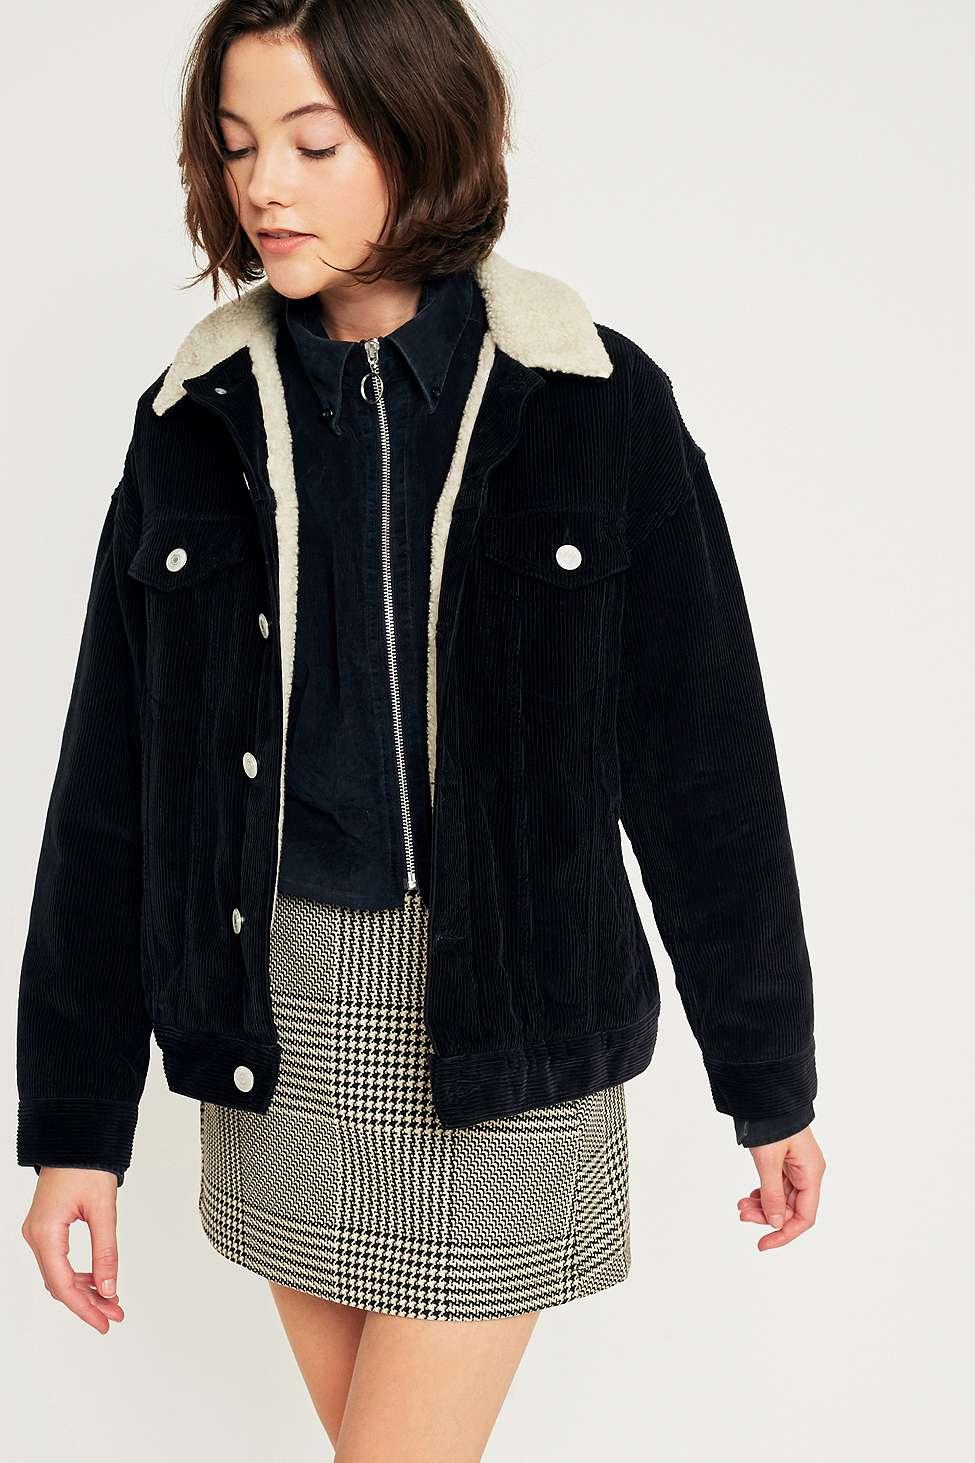 Levi Womens Jean Jacket